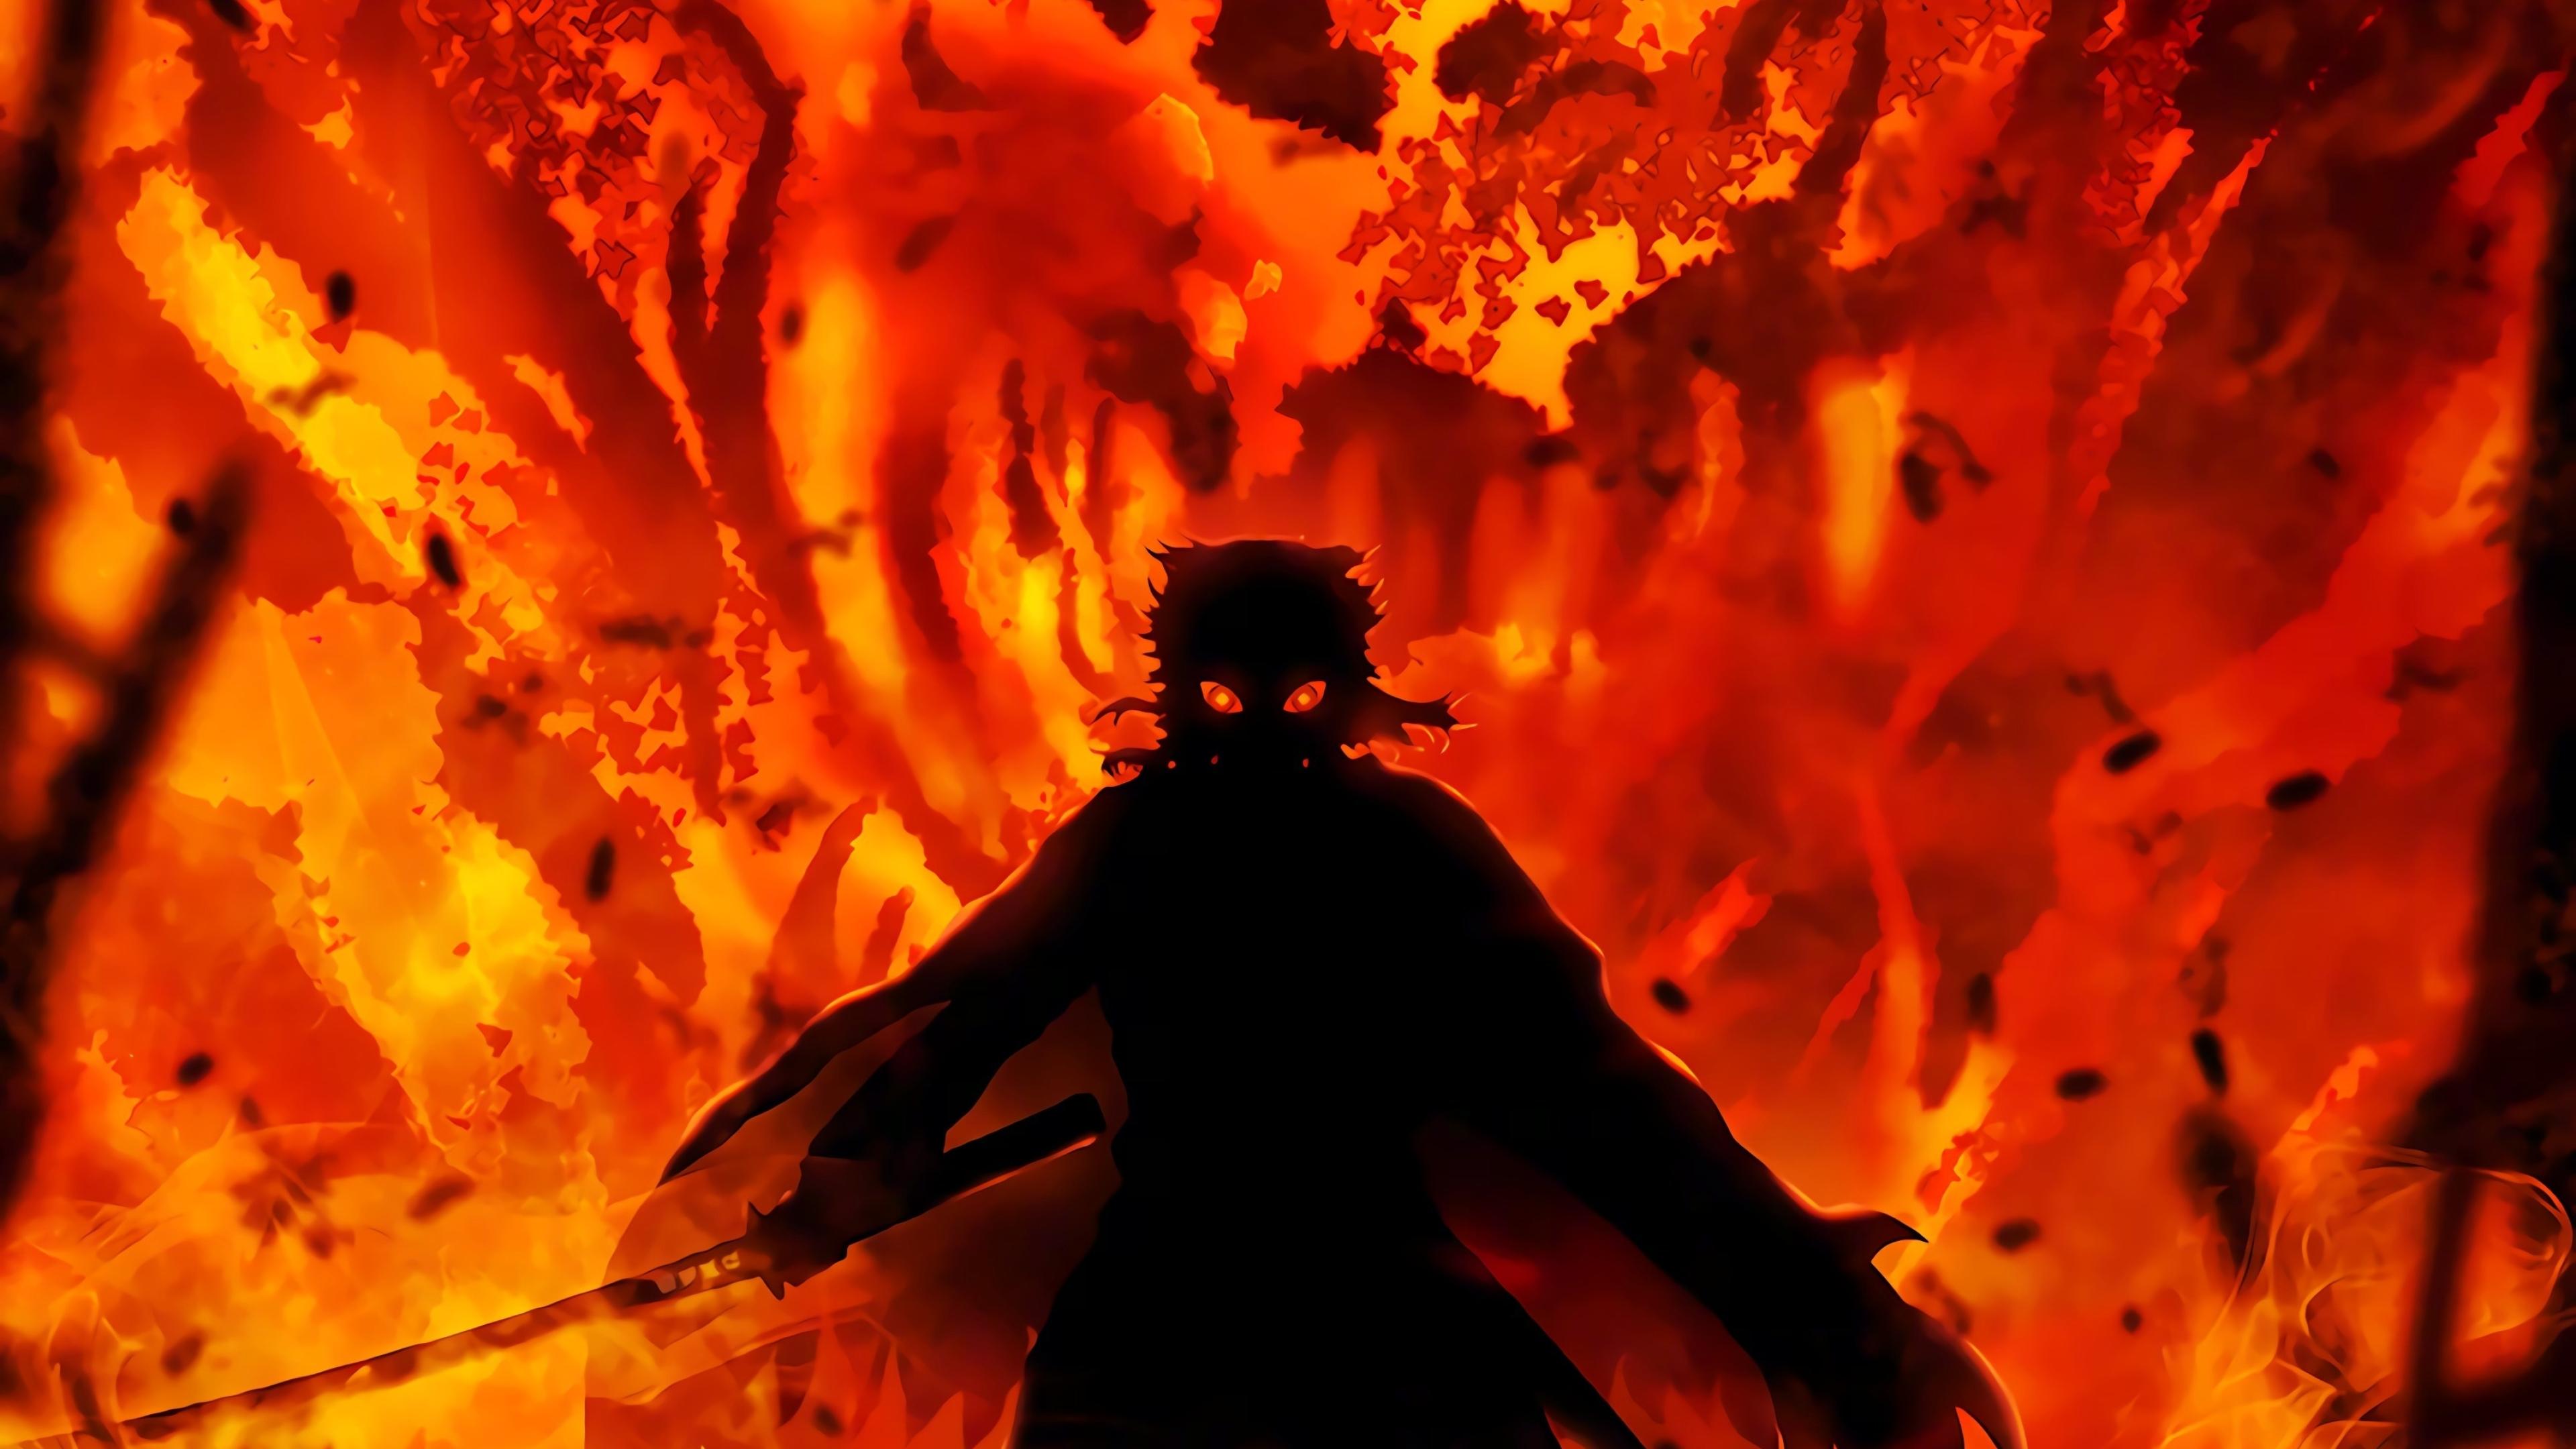 3840x2160 Kyojuro Rengoku Demon Slayer 4K Wallpaper, HD ...